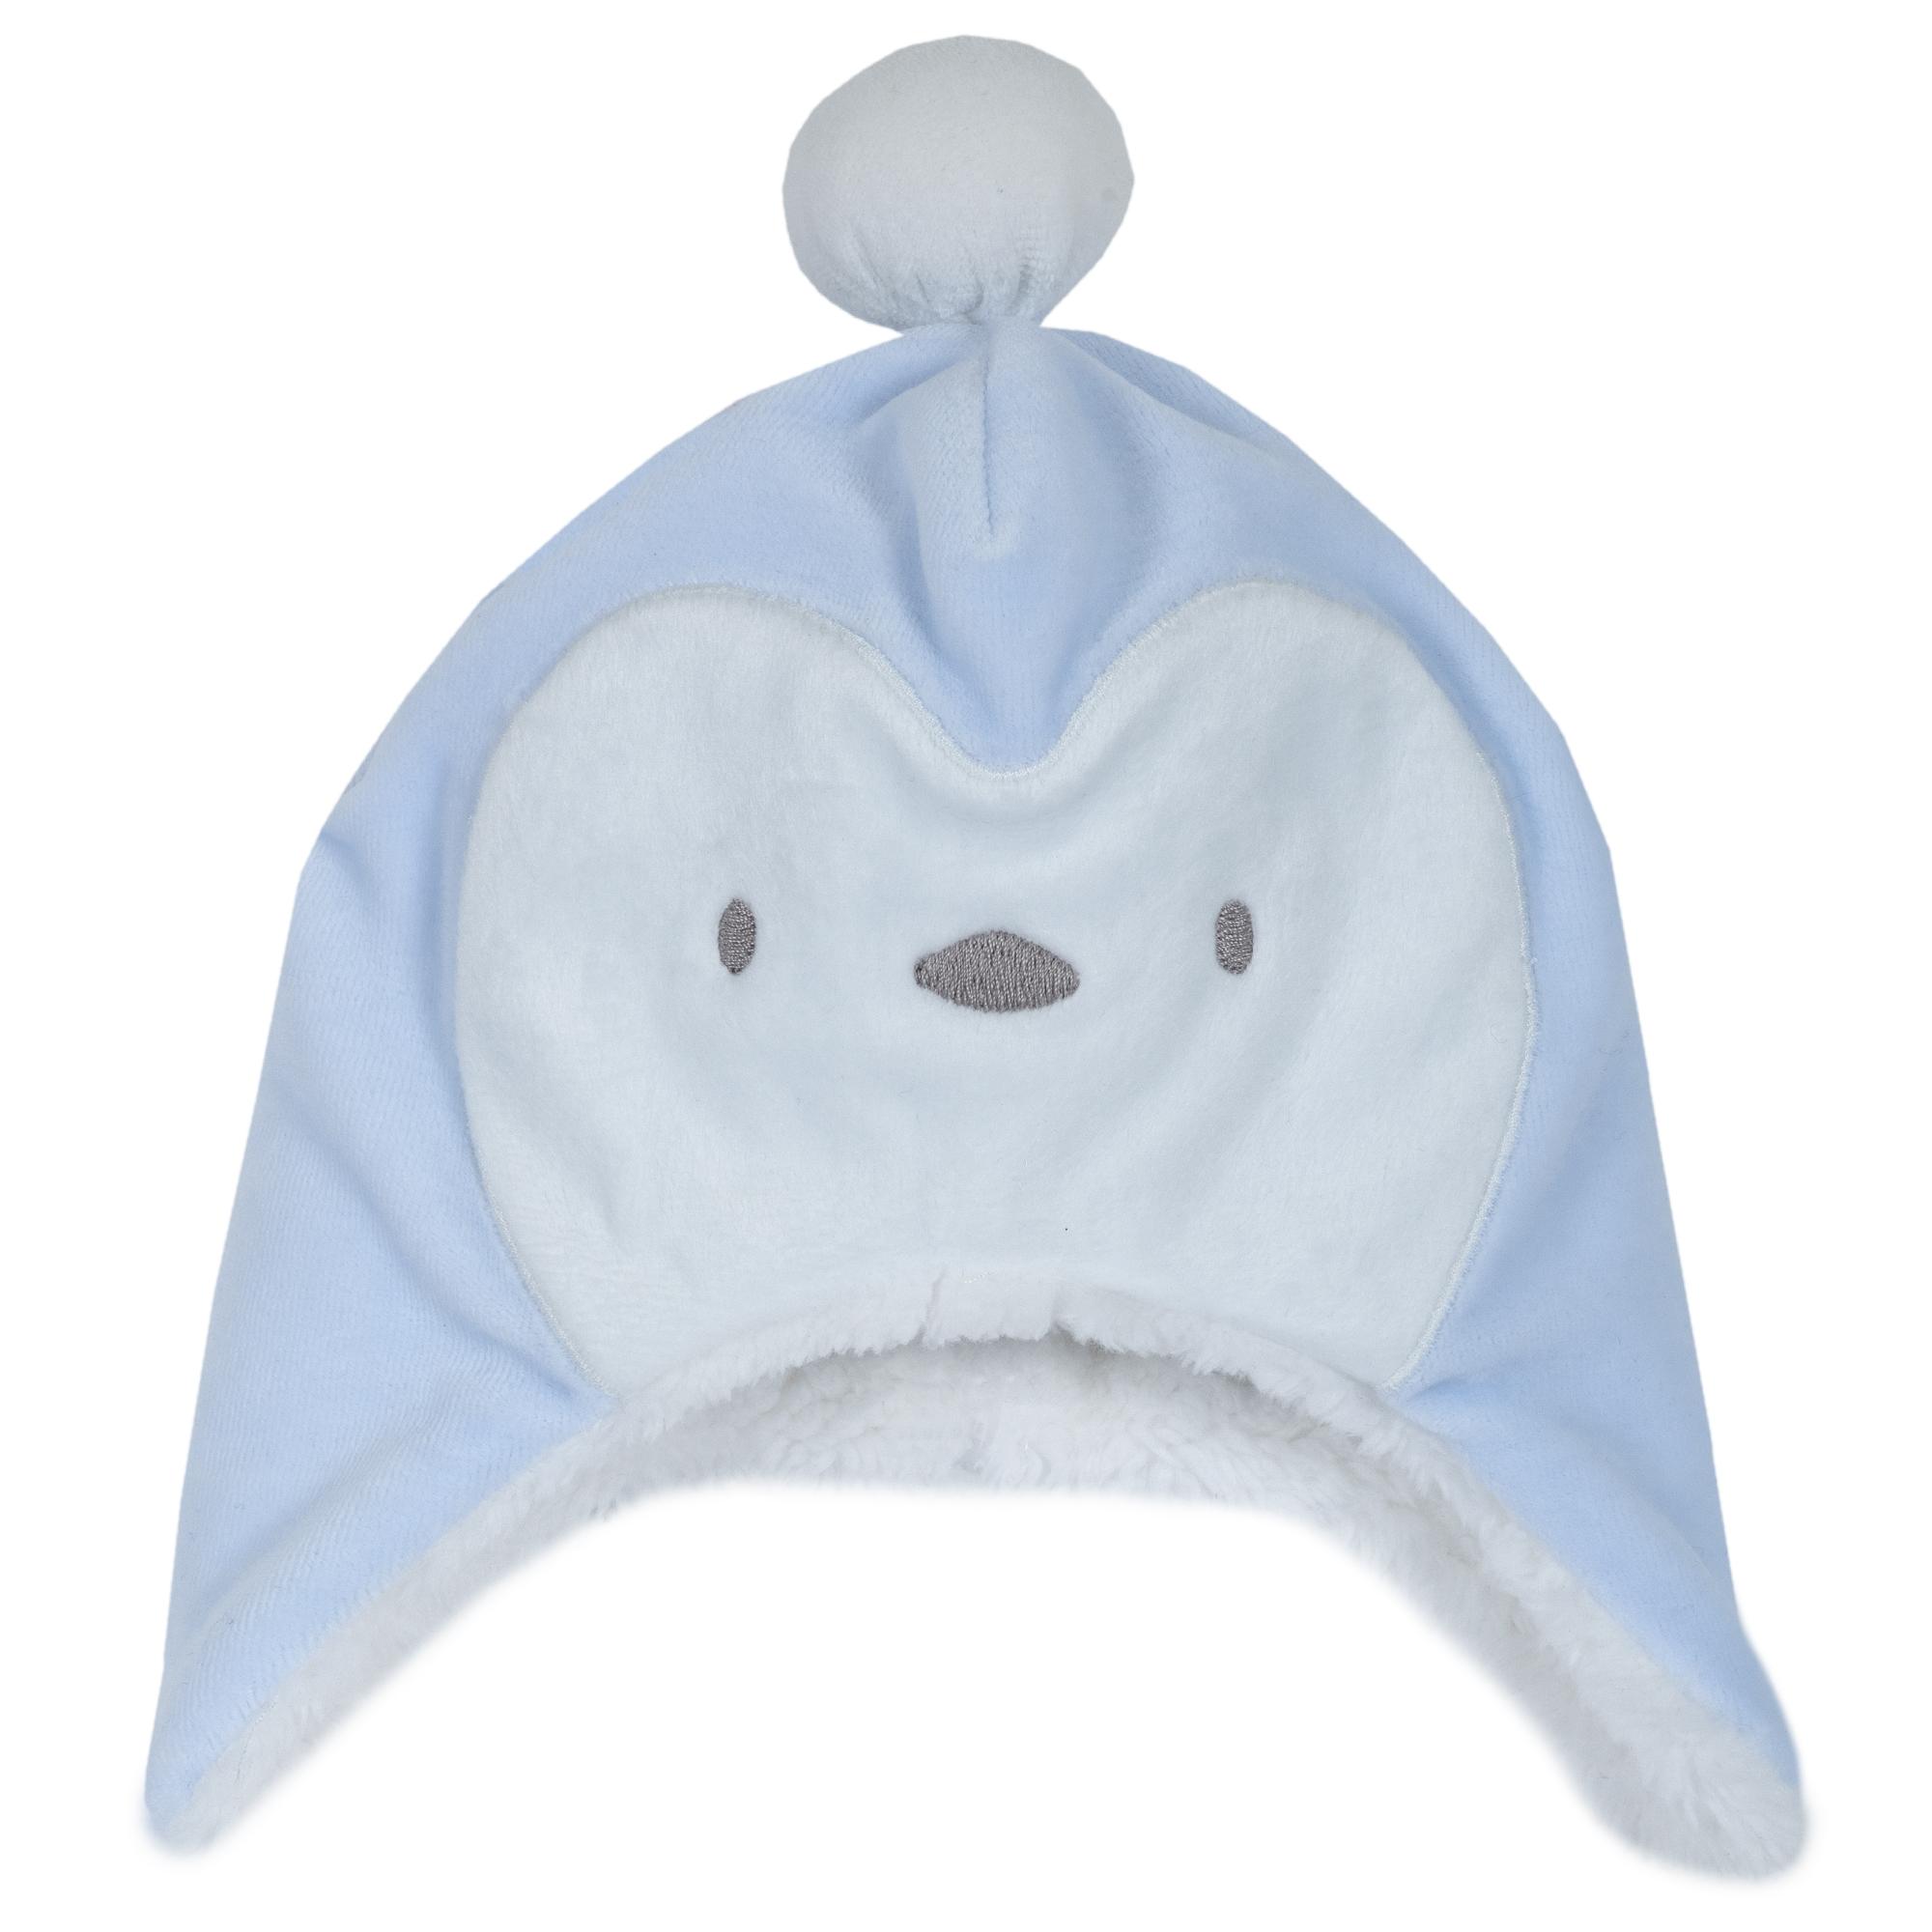 Caciula copii imblanita Chicco, cu urechi, albastru, 04514